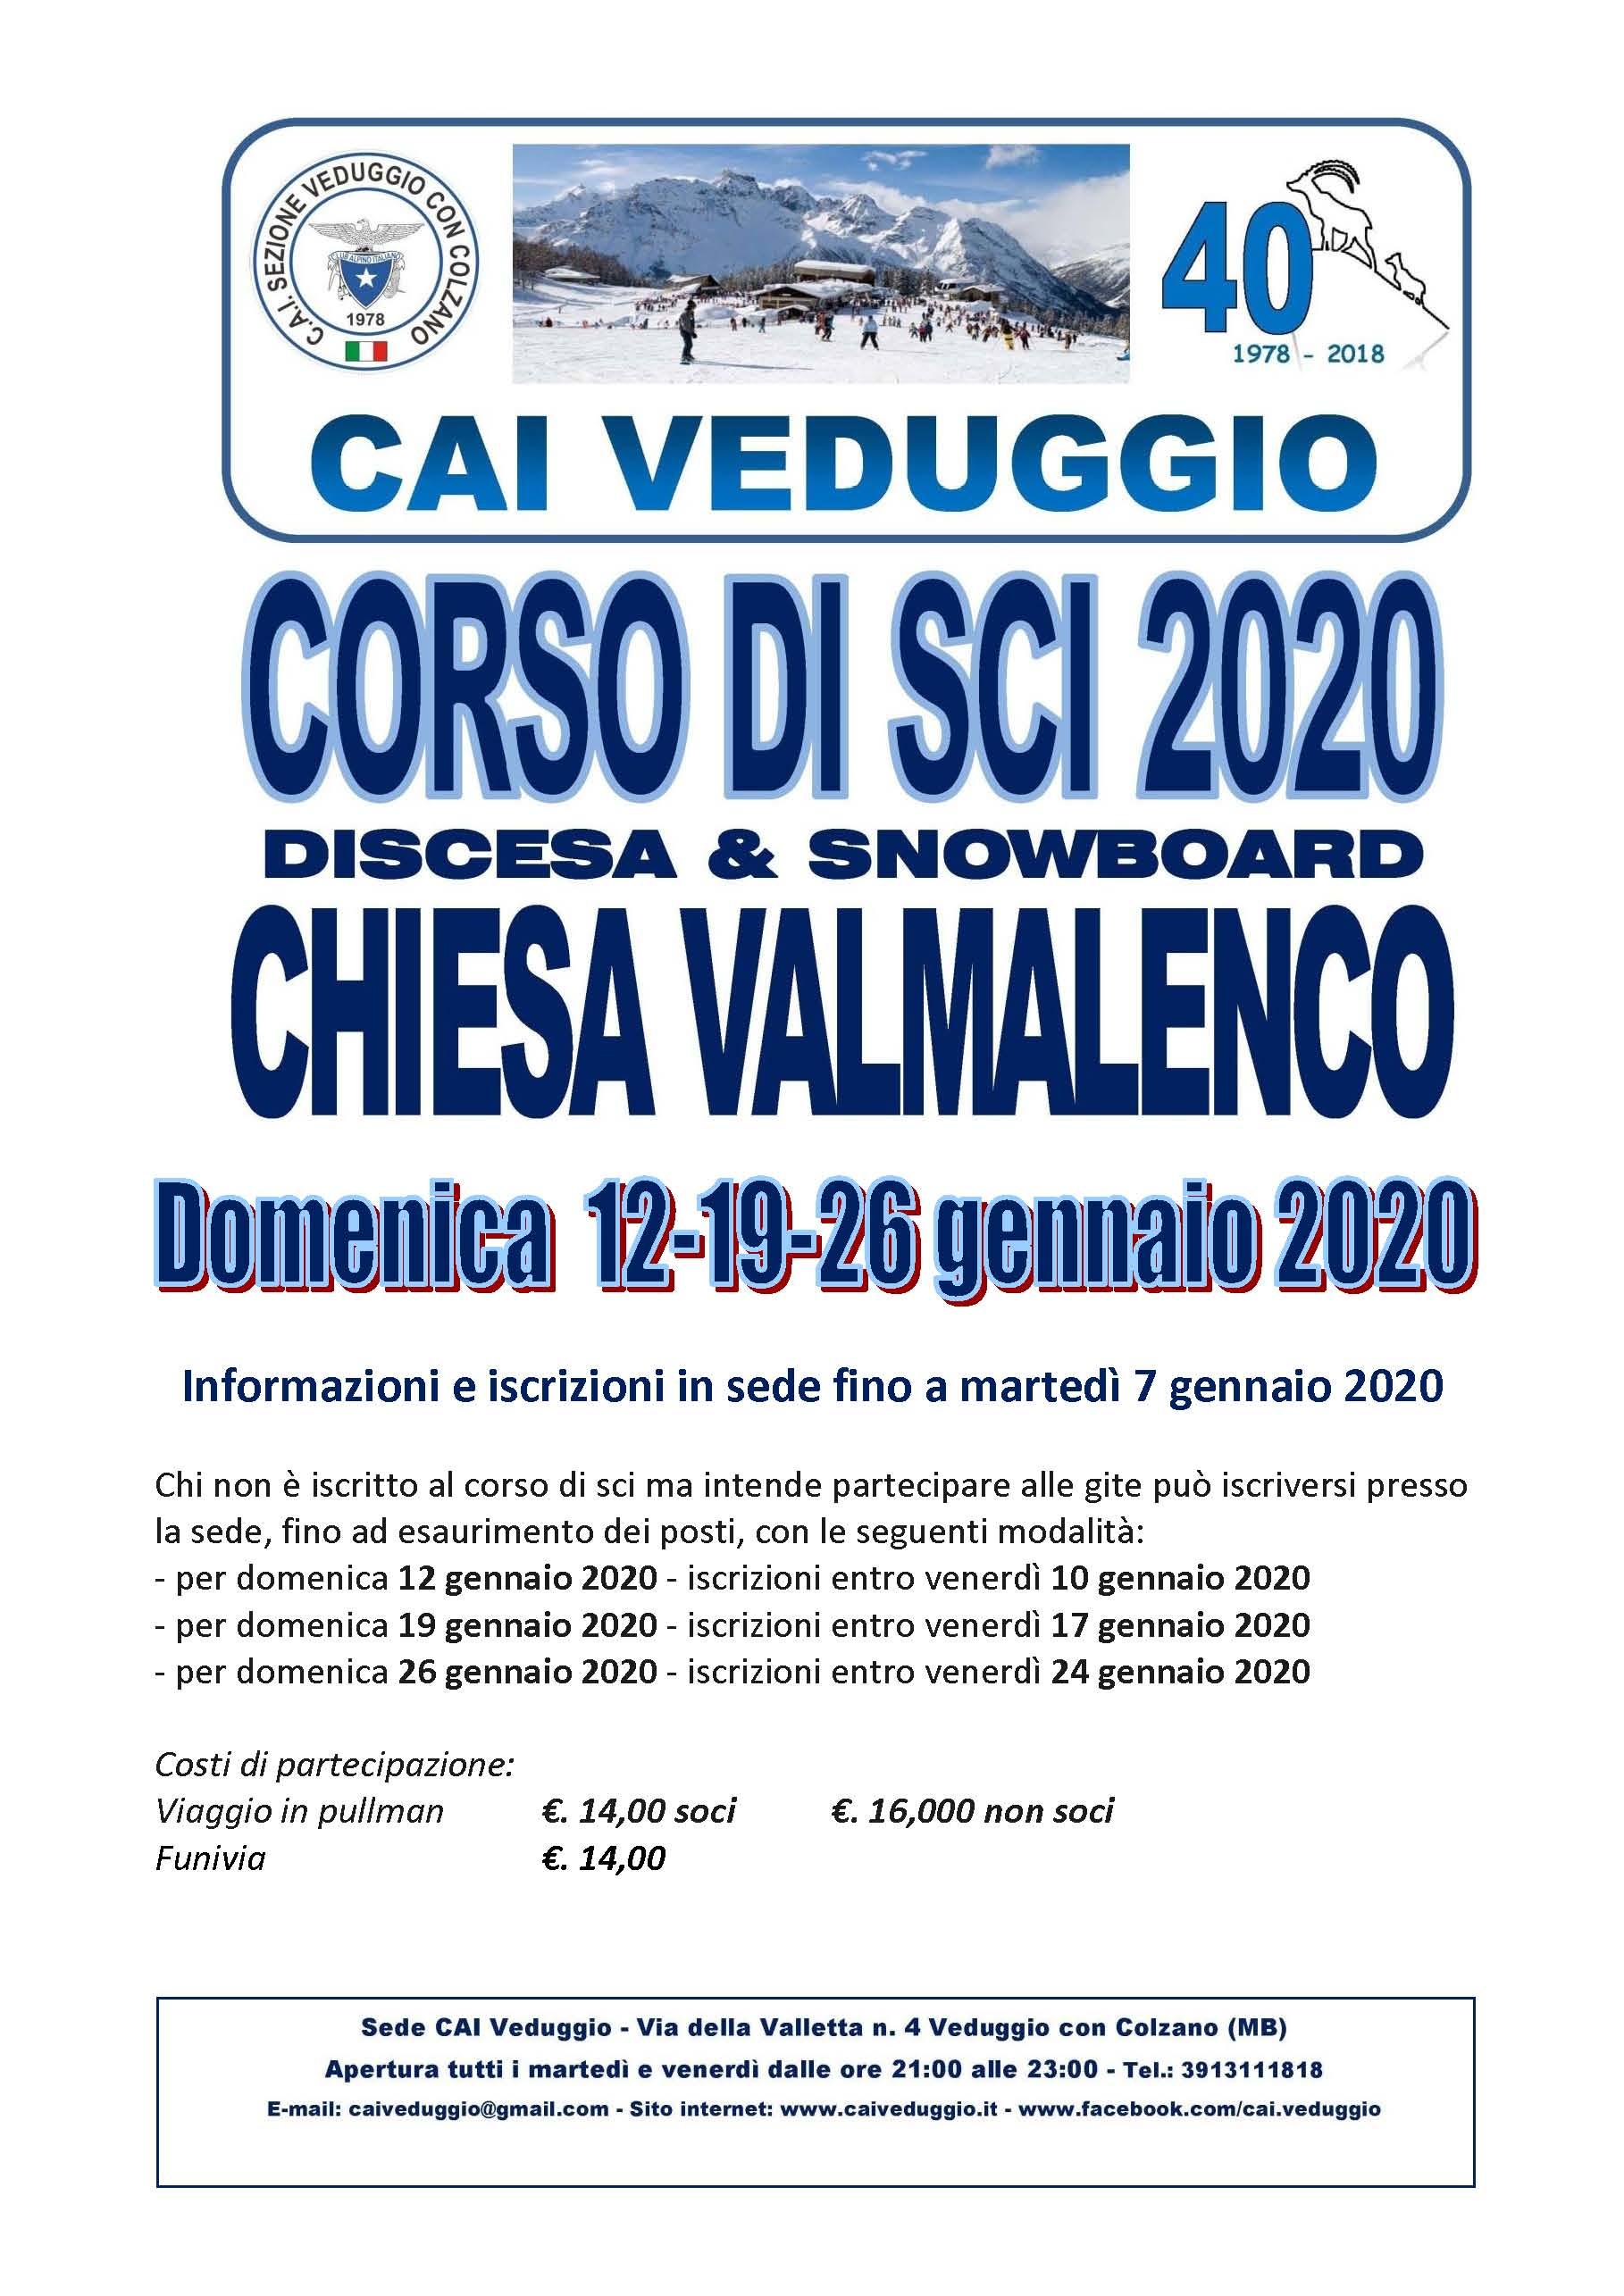 Chiesa Valmalenco 12-19-26 gennaio 2020